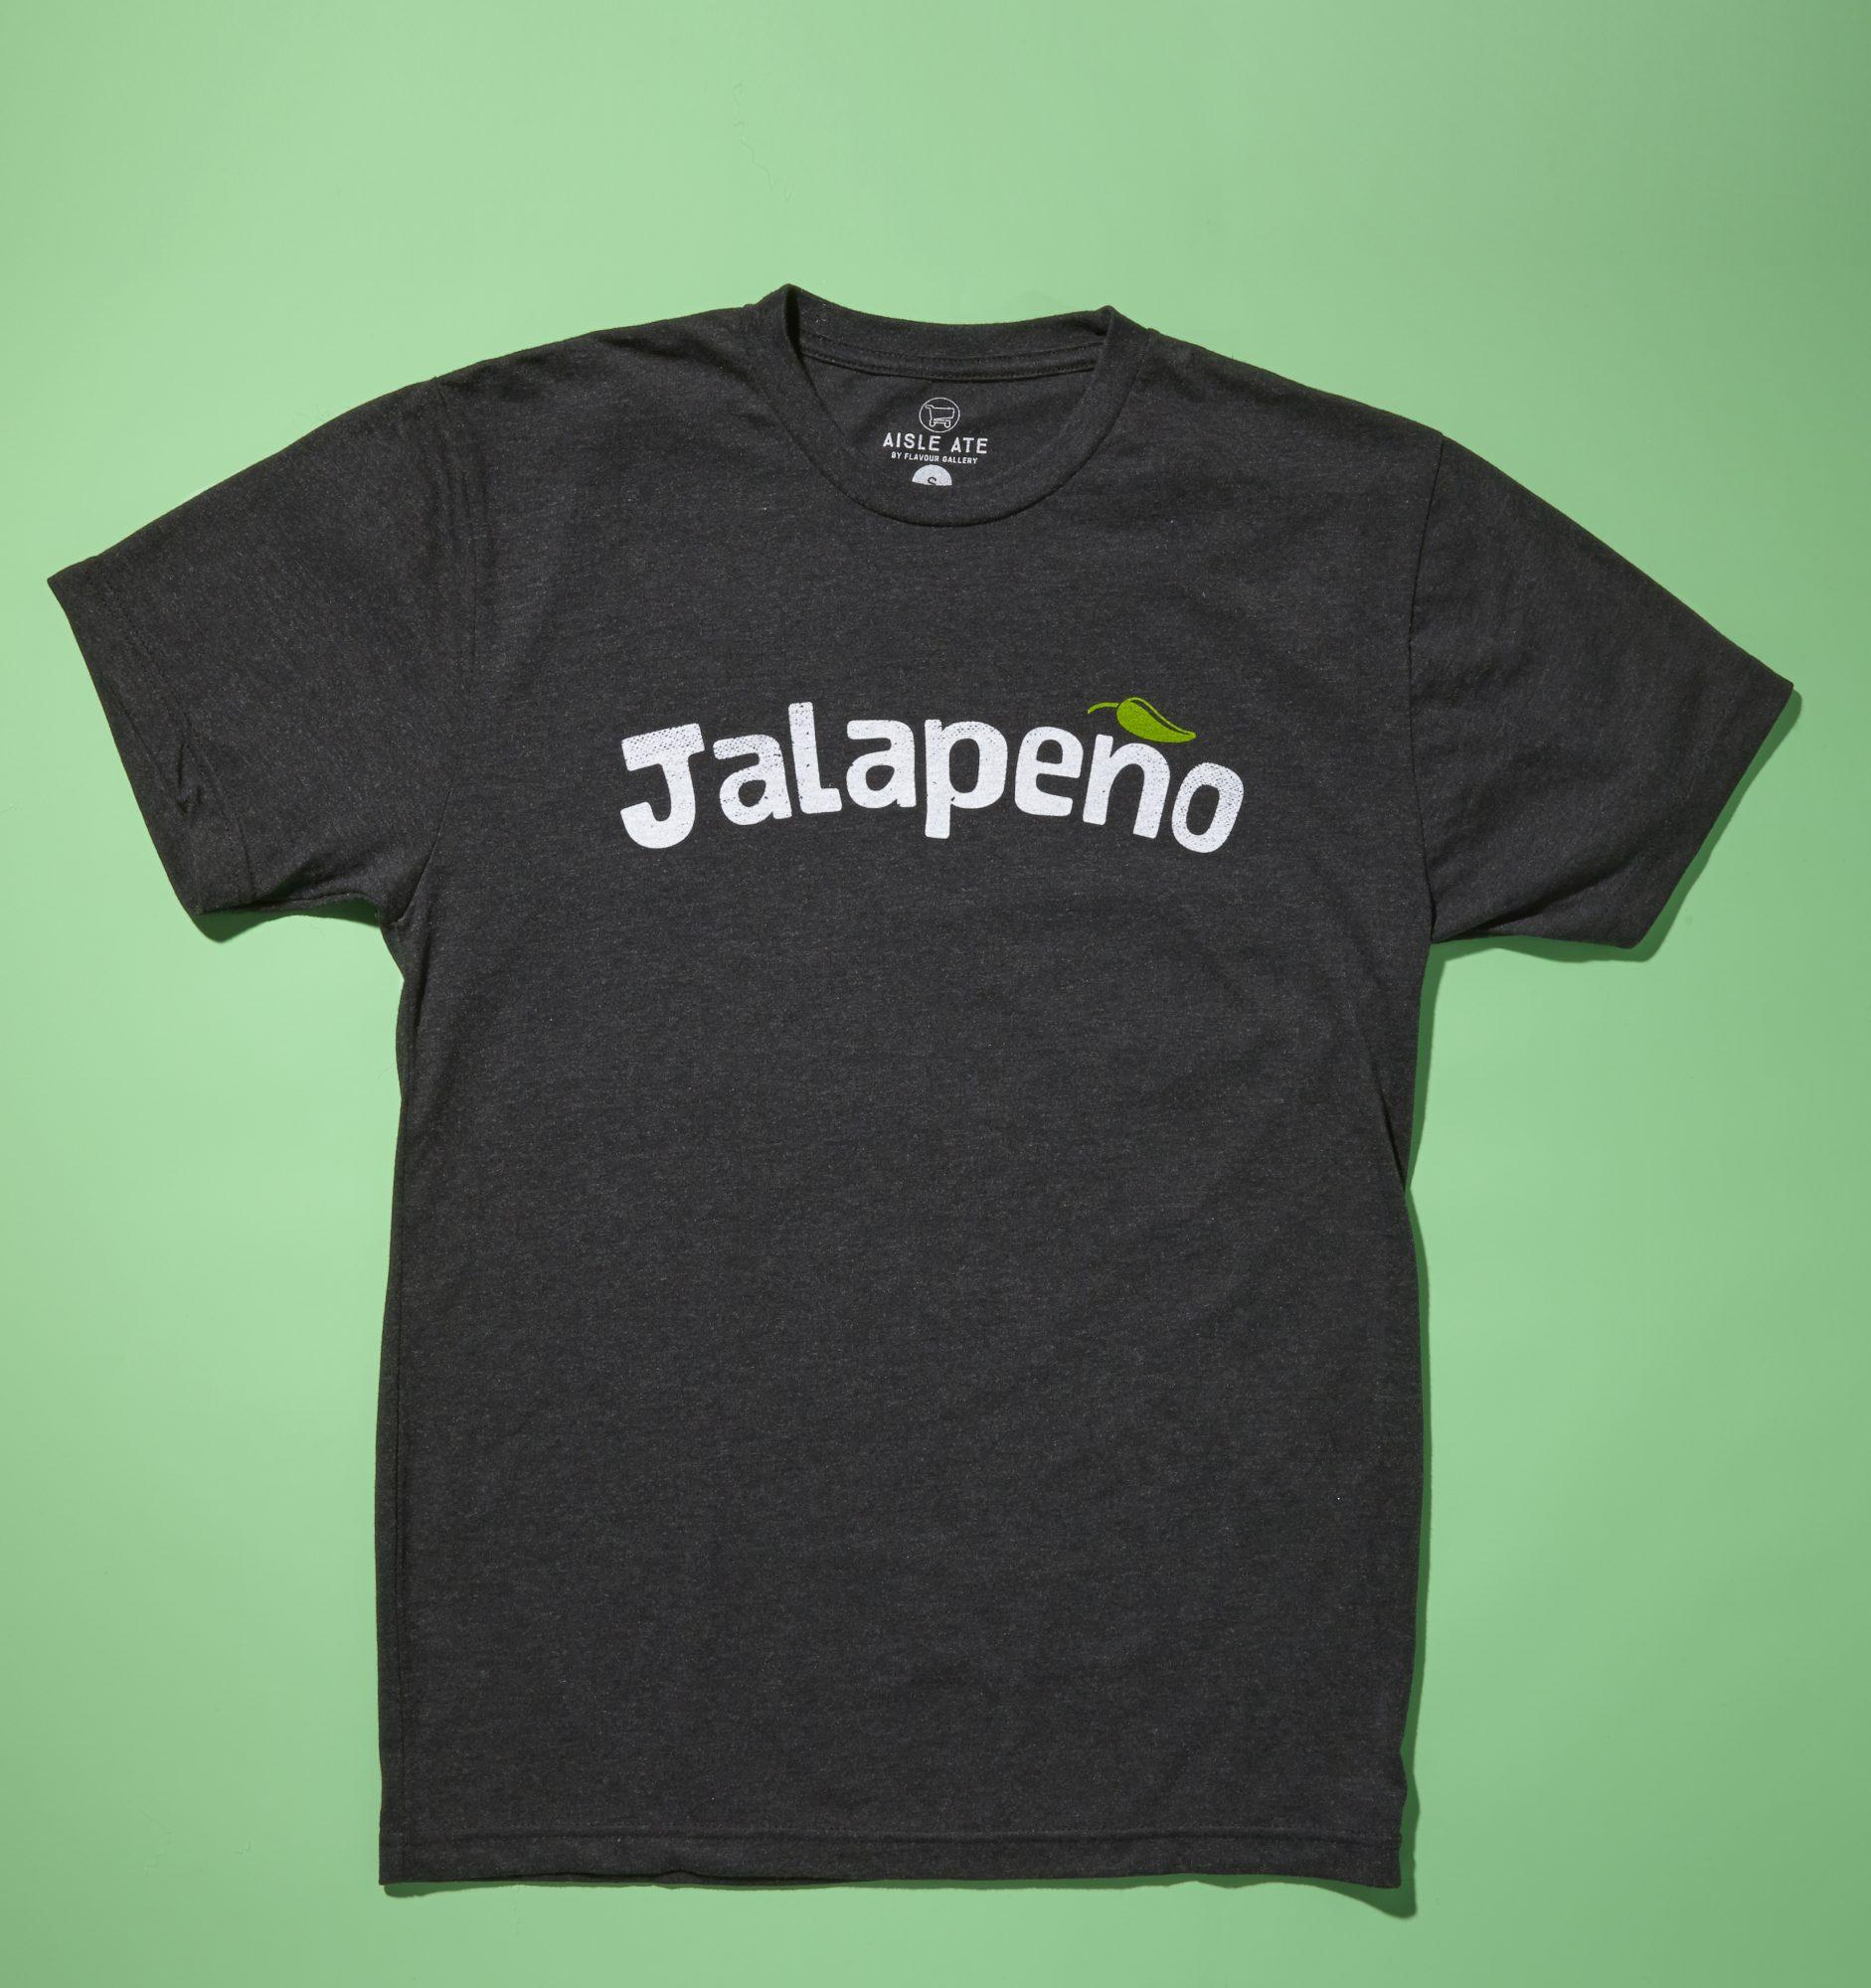 1216RRGFT_JalapenoTshirt.jpg